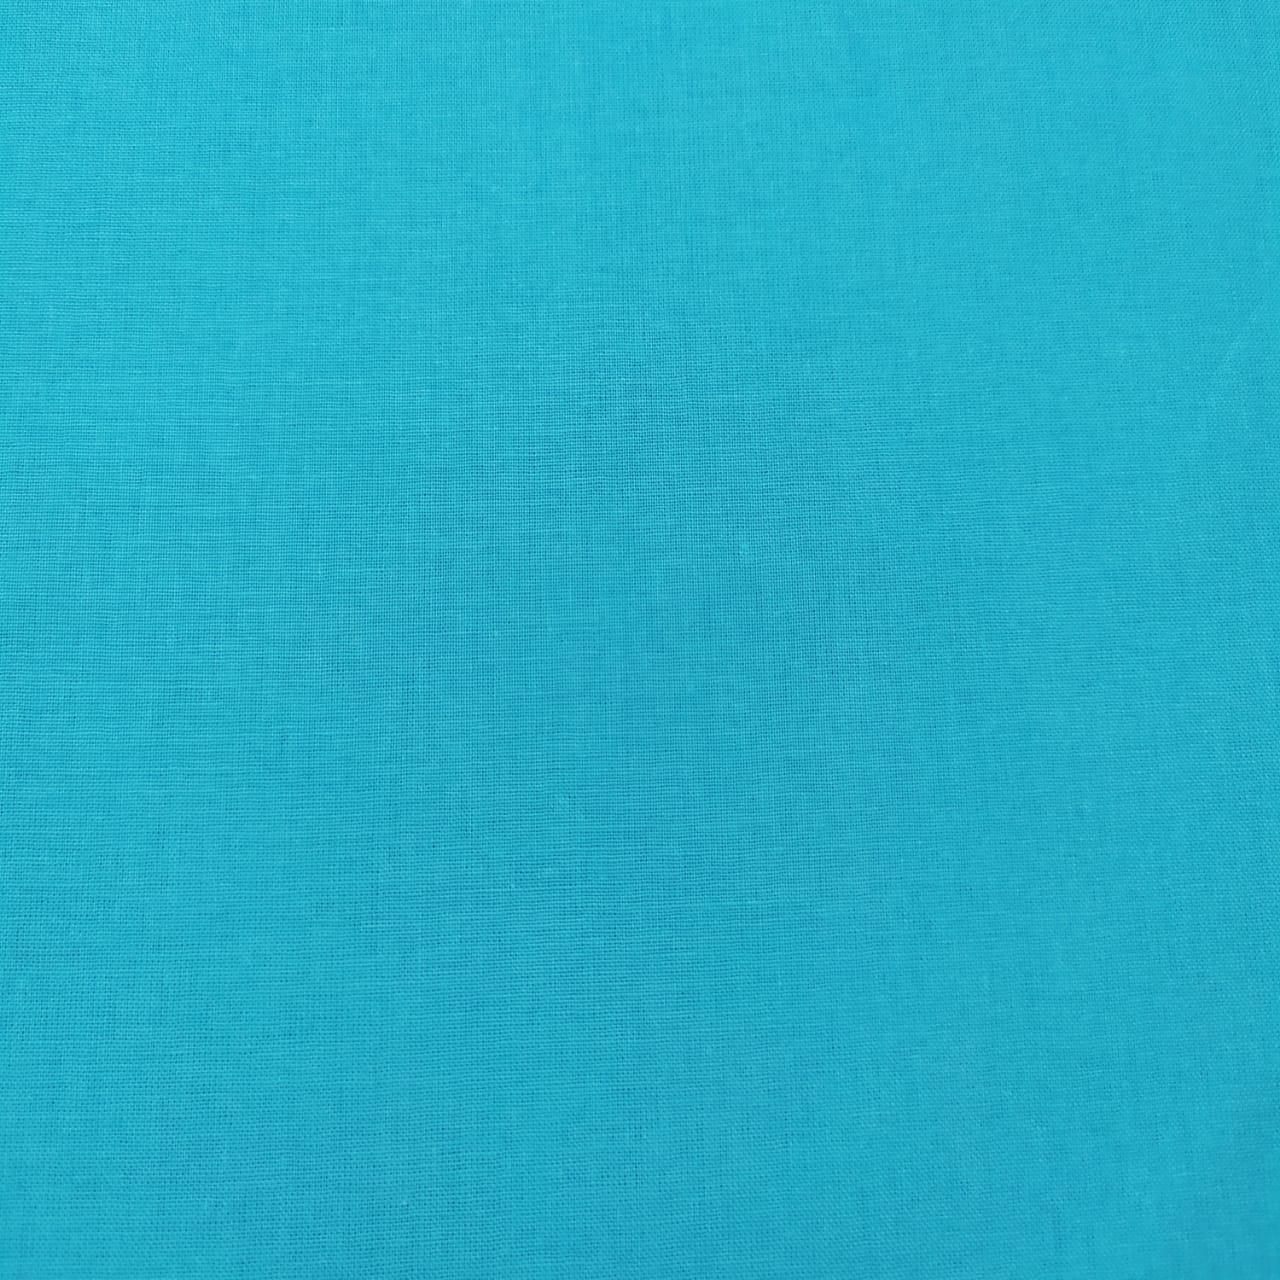 Tecido Tricoline Lisa Azul Tiffany